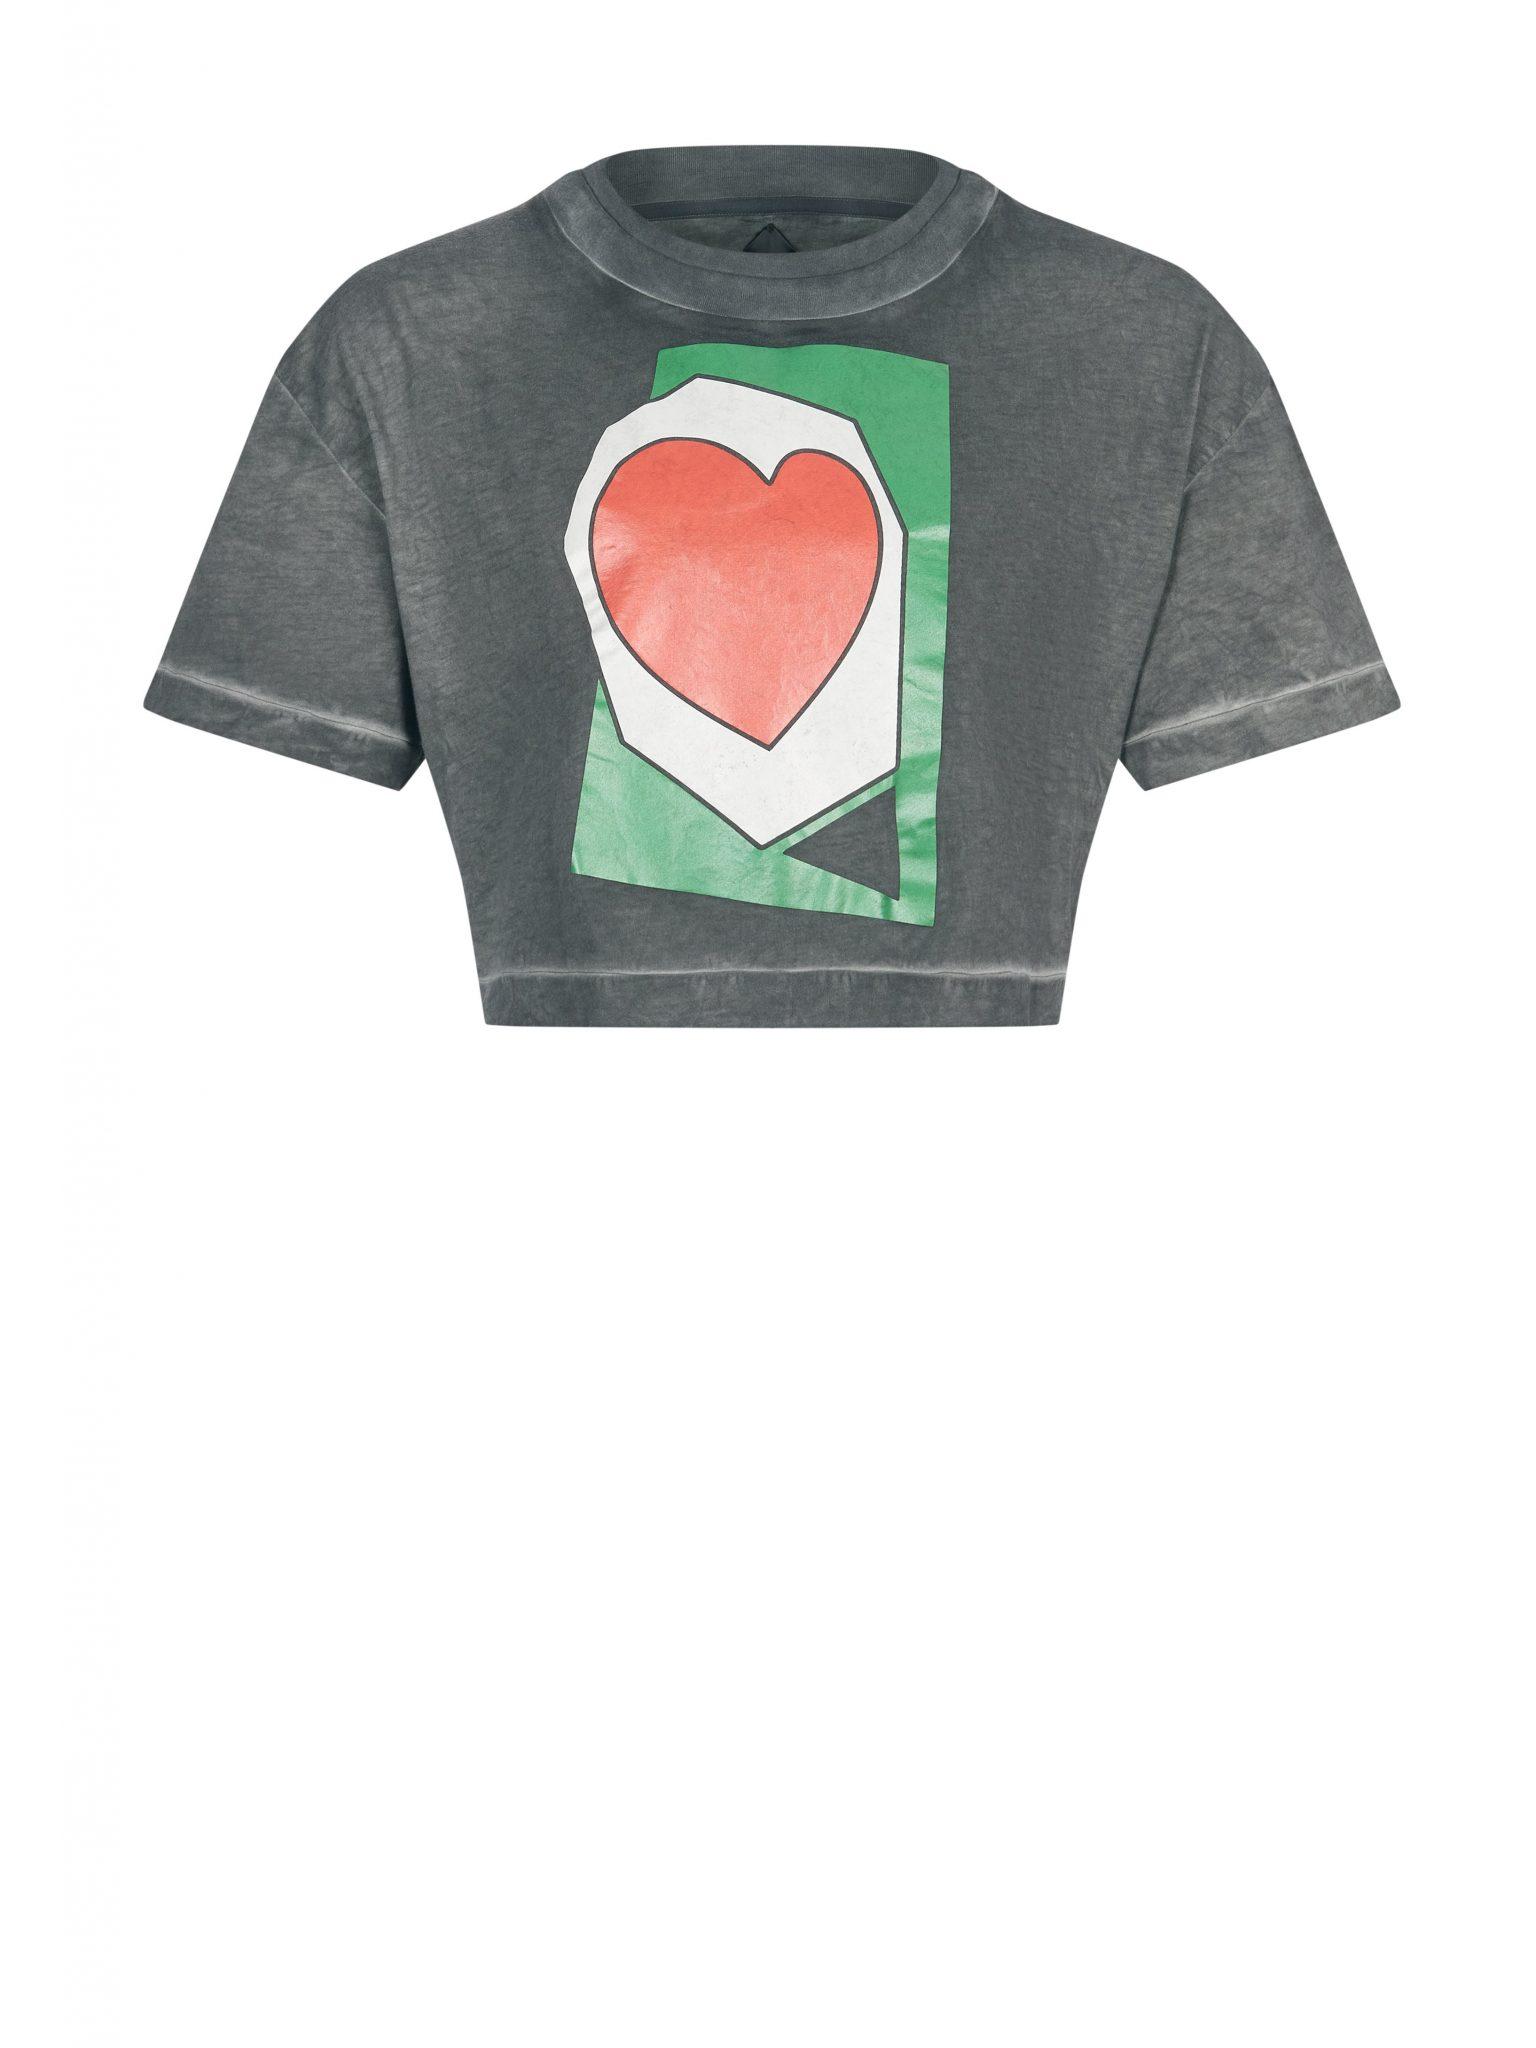 HEARTCROPPEDT-SHIRTBLACK_Mens_0